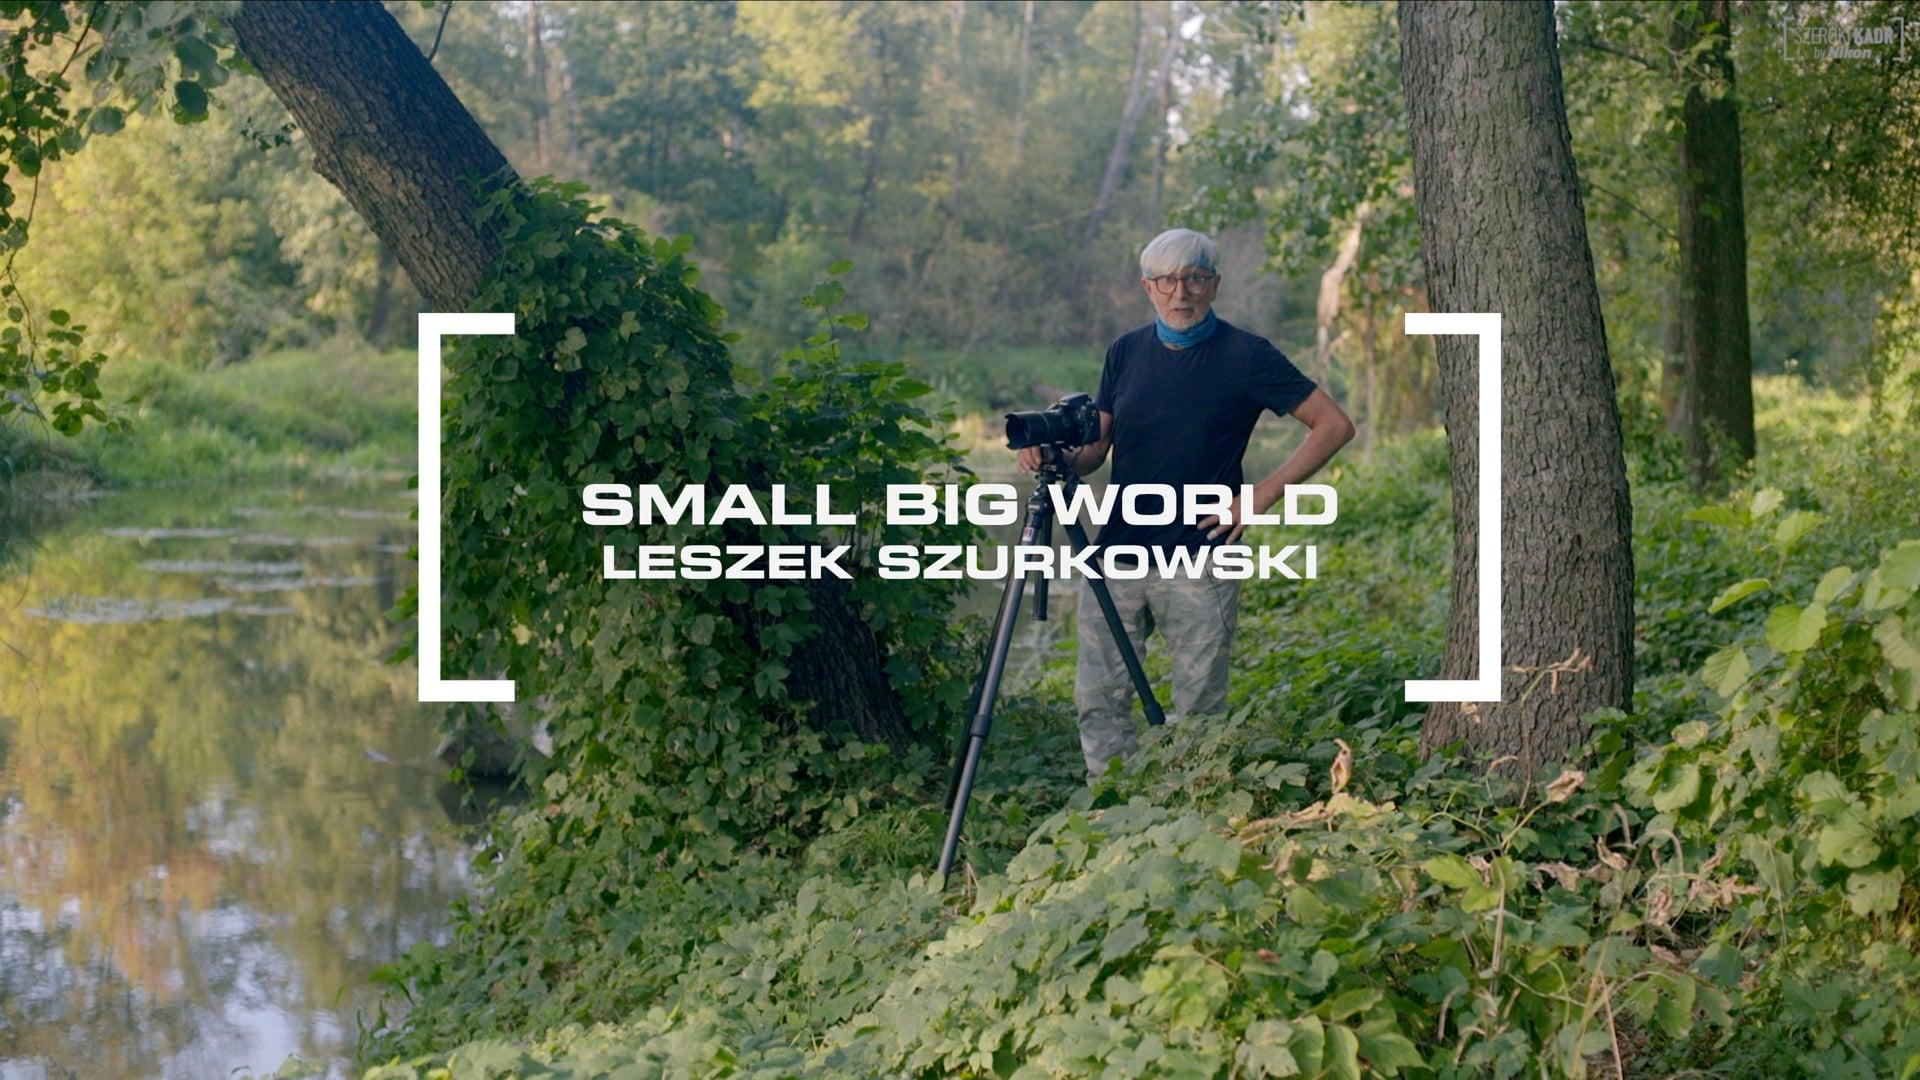 SMALL BIG WORLD